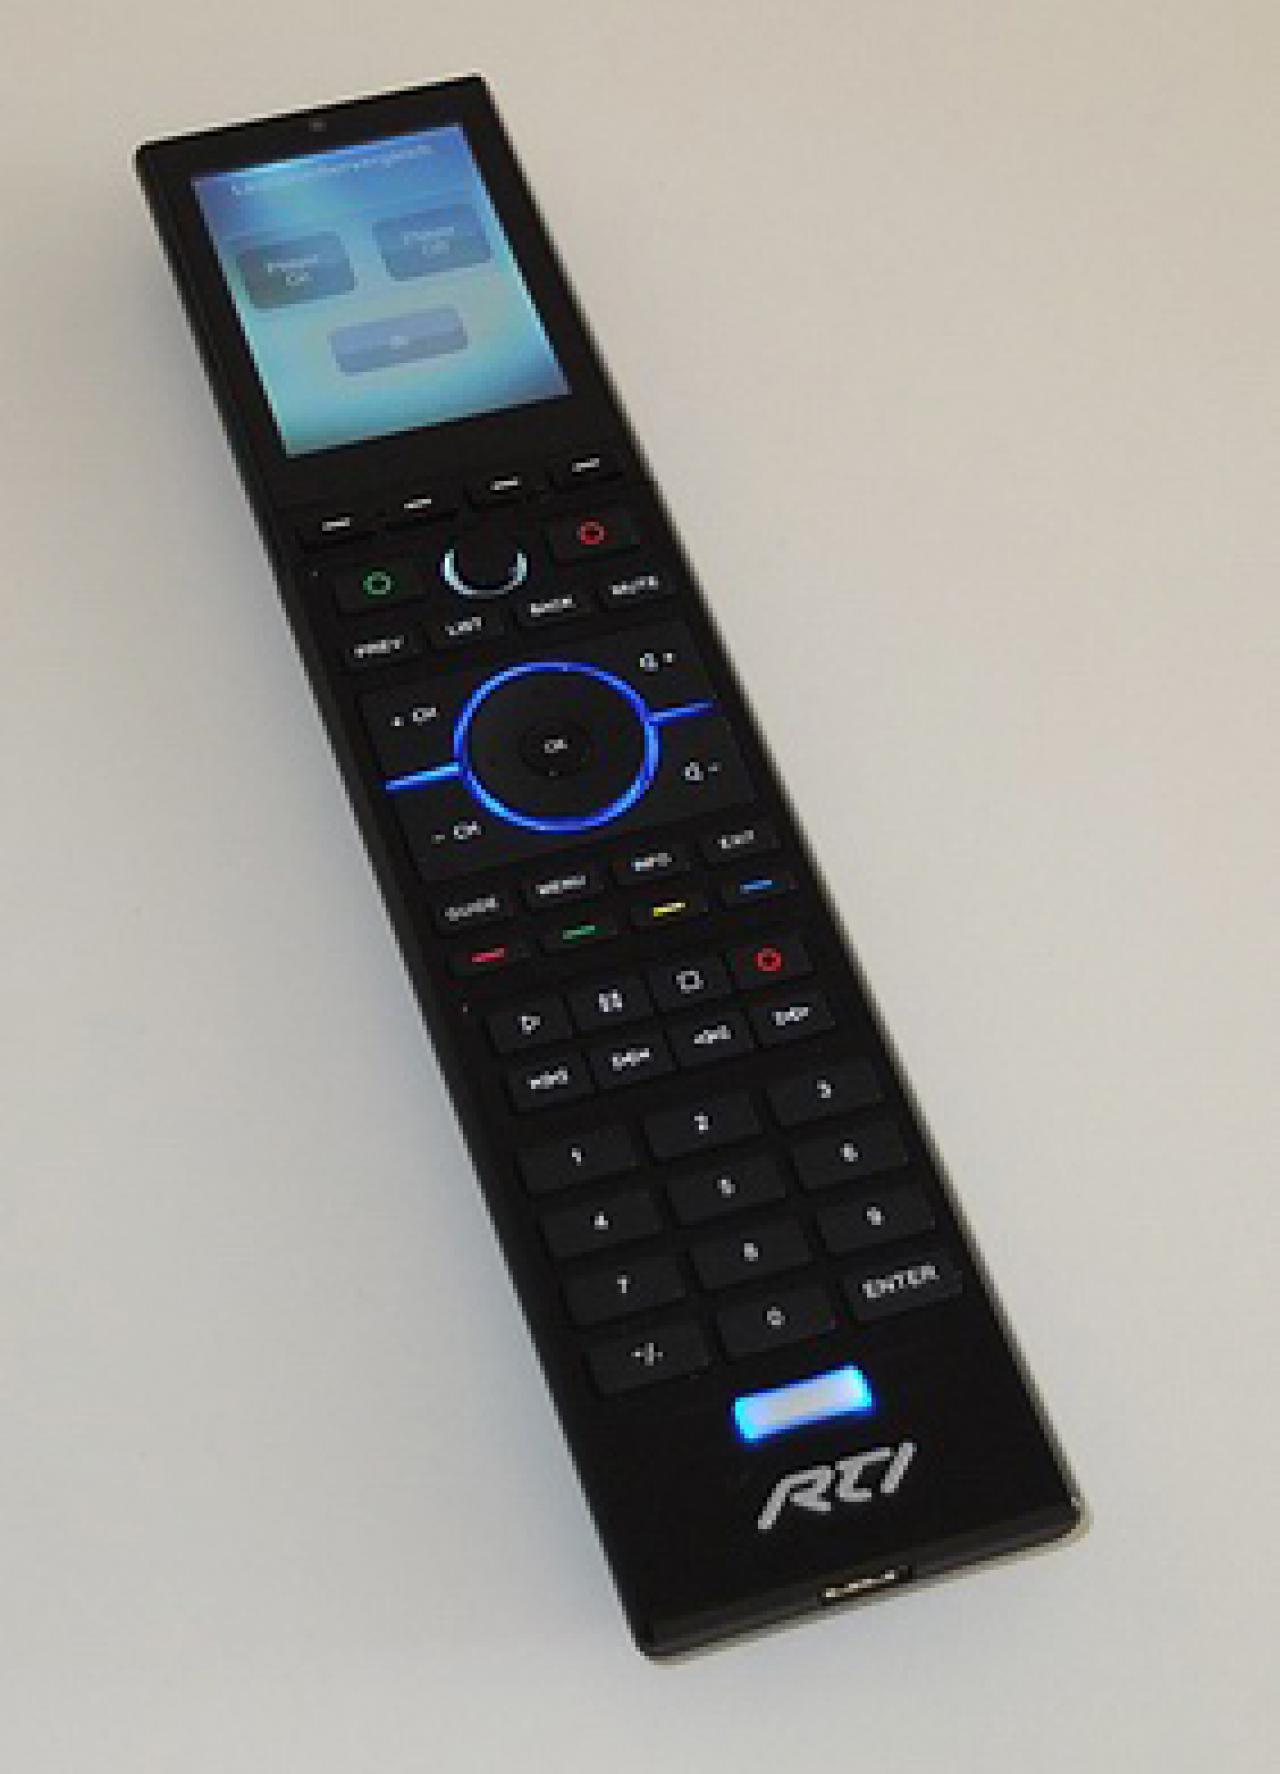 RTI Fernbedienung mit Farbtouch-Display